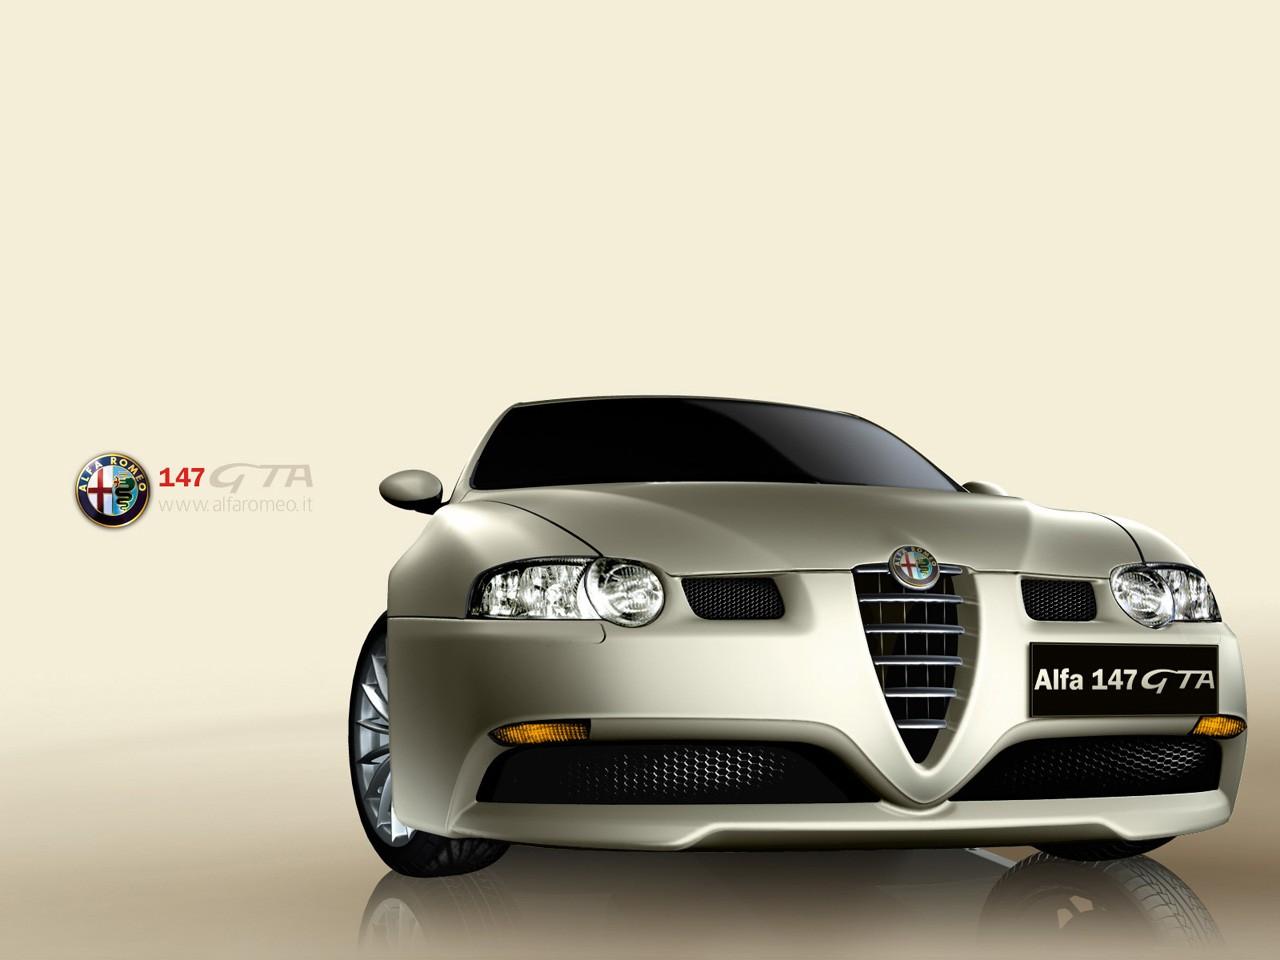 http://1.bp.blogspot.com/_VHFwOhW7ZKg/TMH4z2zB6OI/AAAAAAAAAAg/v-4LUptXjbk/s1600/Alfa_Romeo_147_GTA_1280x960.jpg